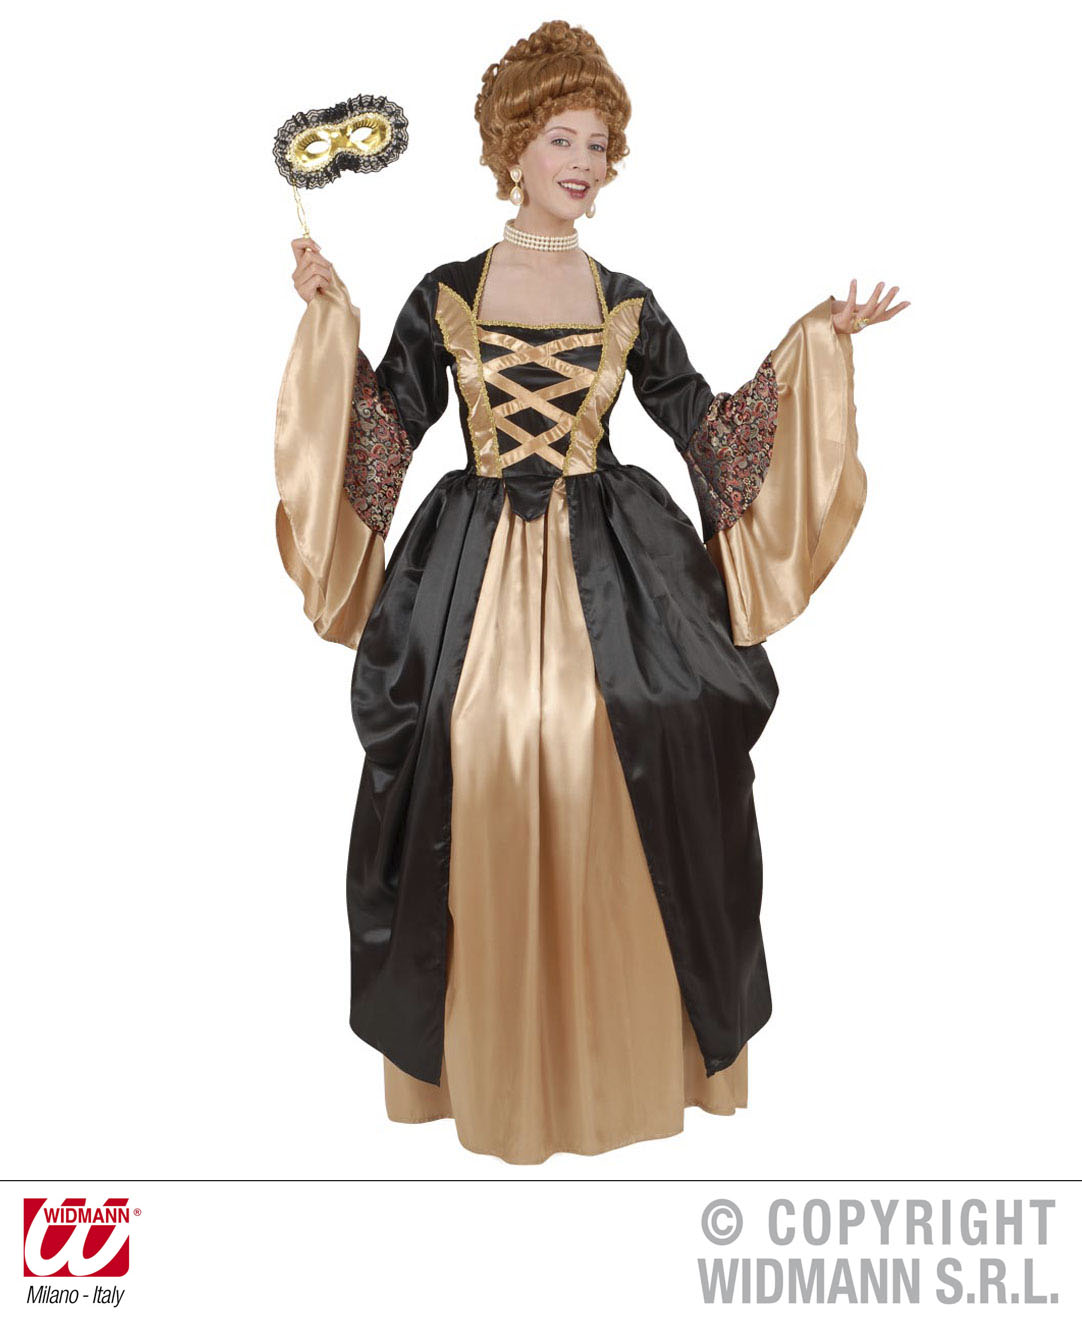 Costume CONSTANZE - Dress with Petticoat Size M Medieval ...